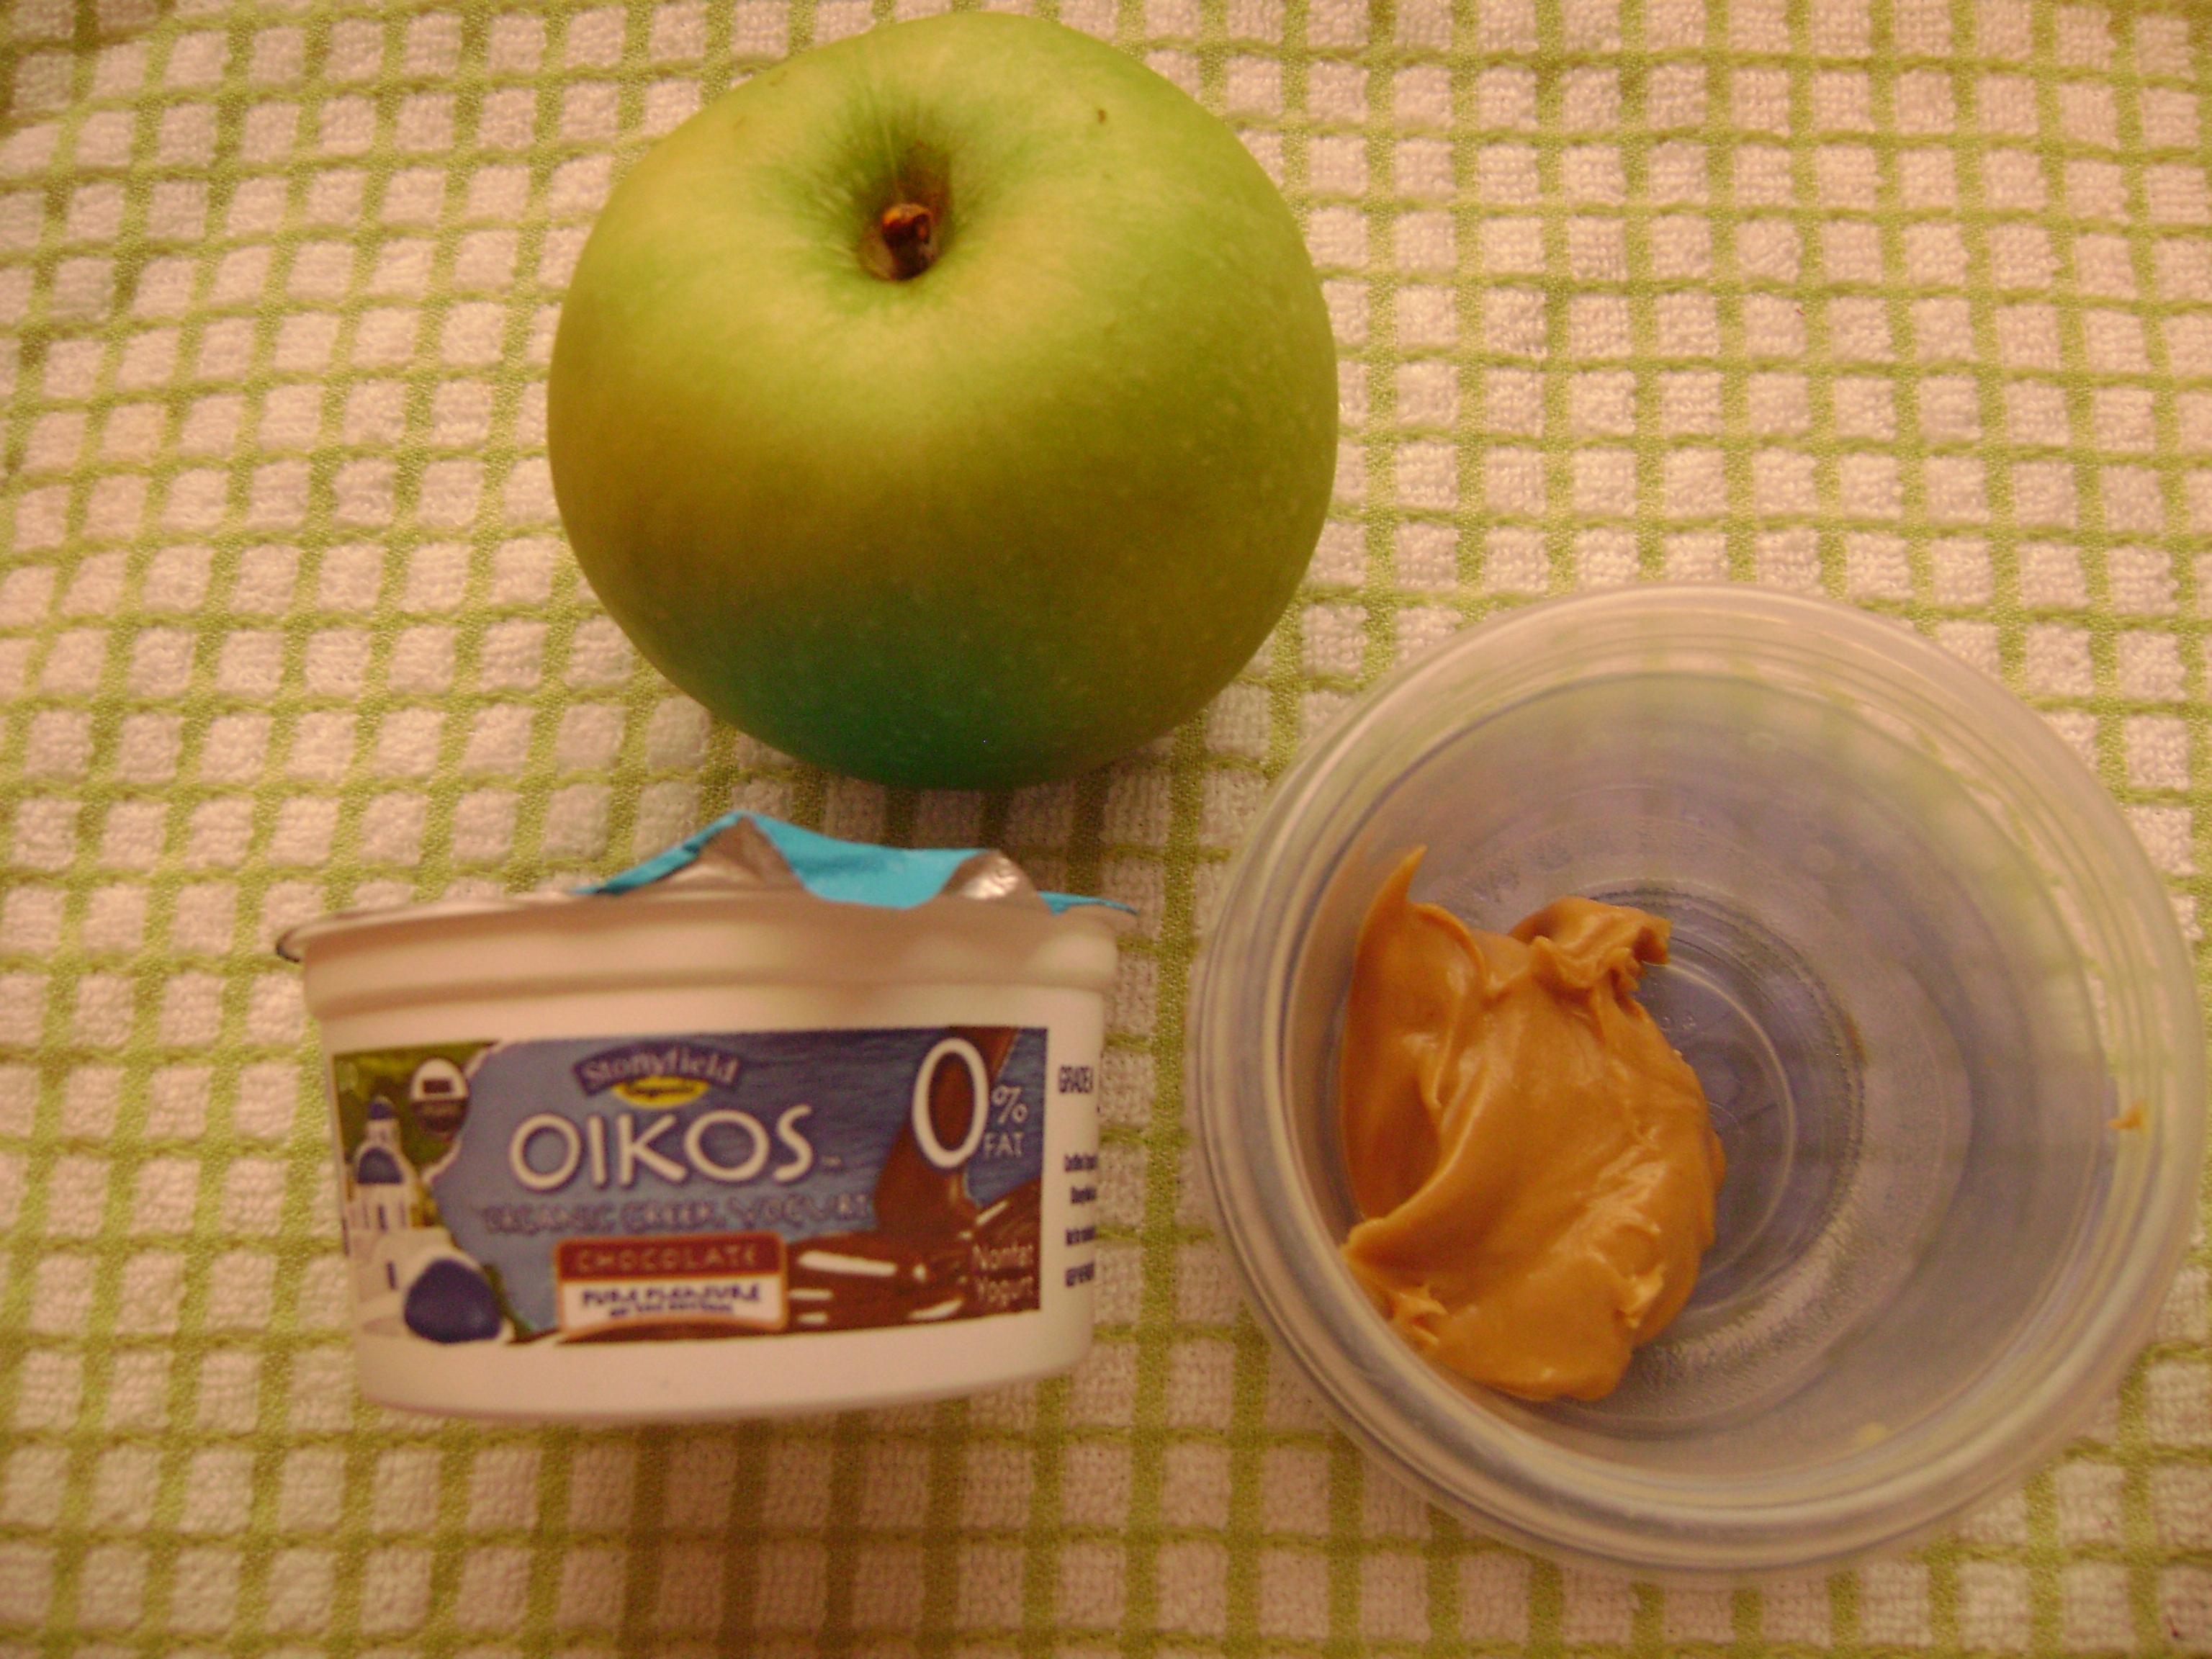 Can Dogs Eat Oikos Greek Yogurt